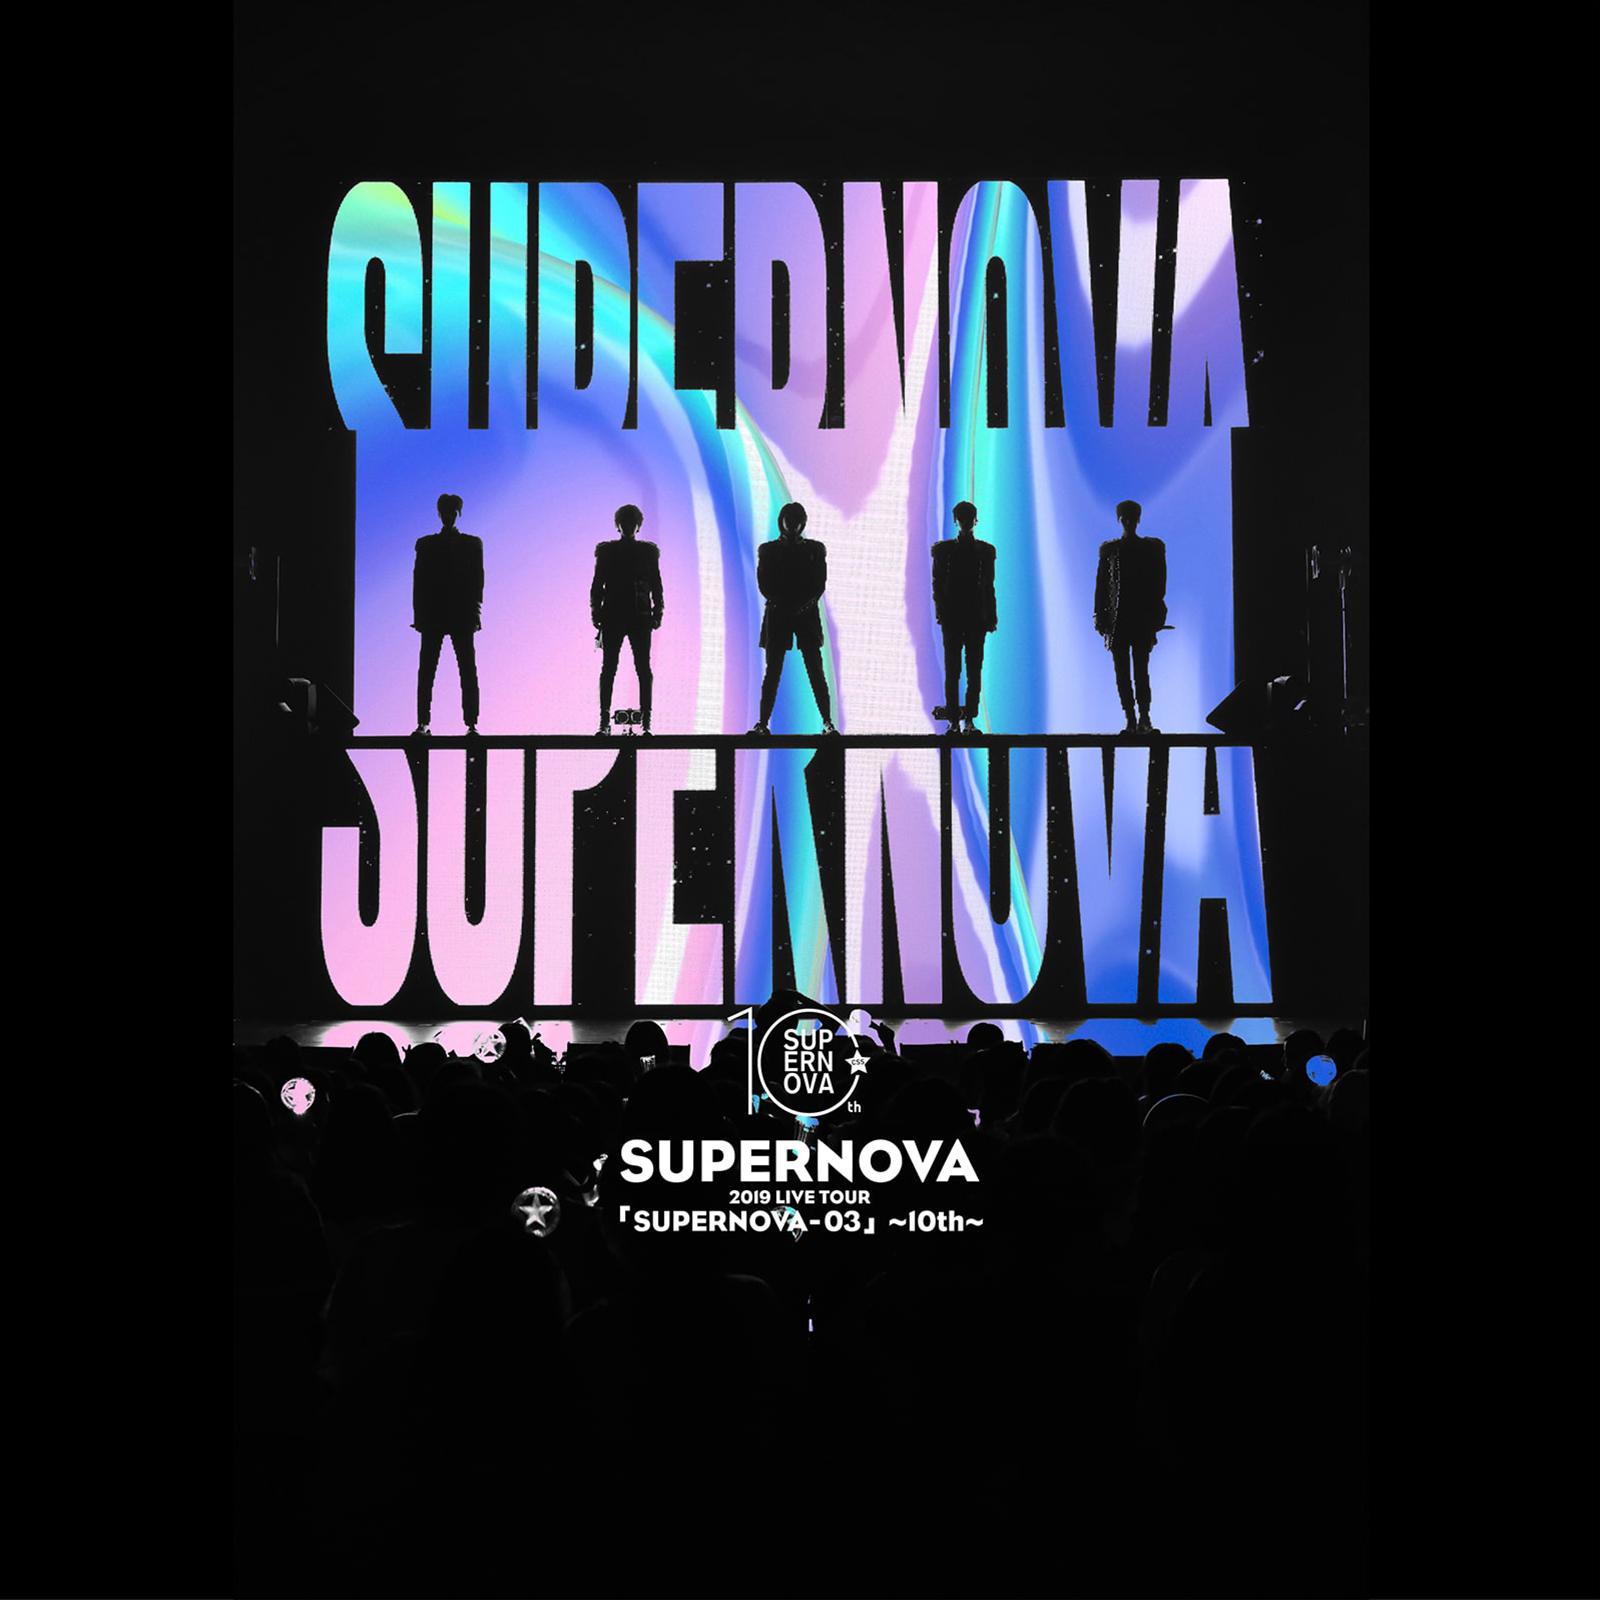 SUPERNOVA_2019 LIVE TOUR「SUPERNOVA-03」~10th〜-min